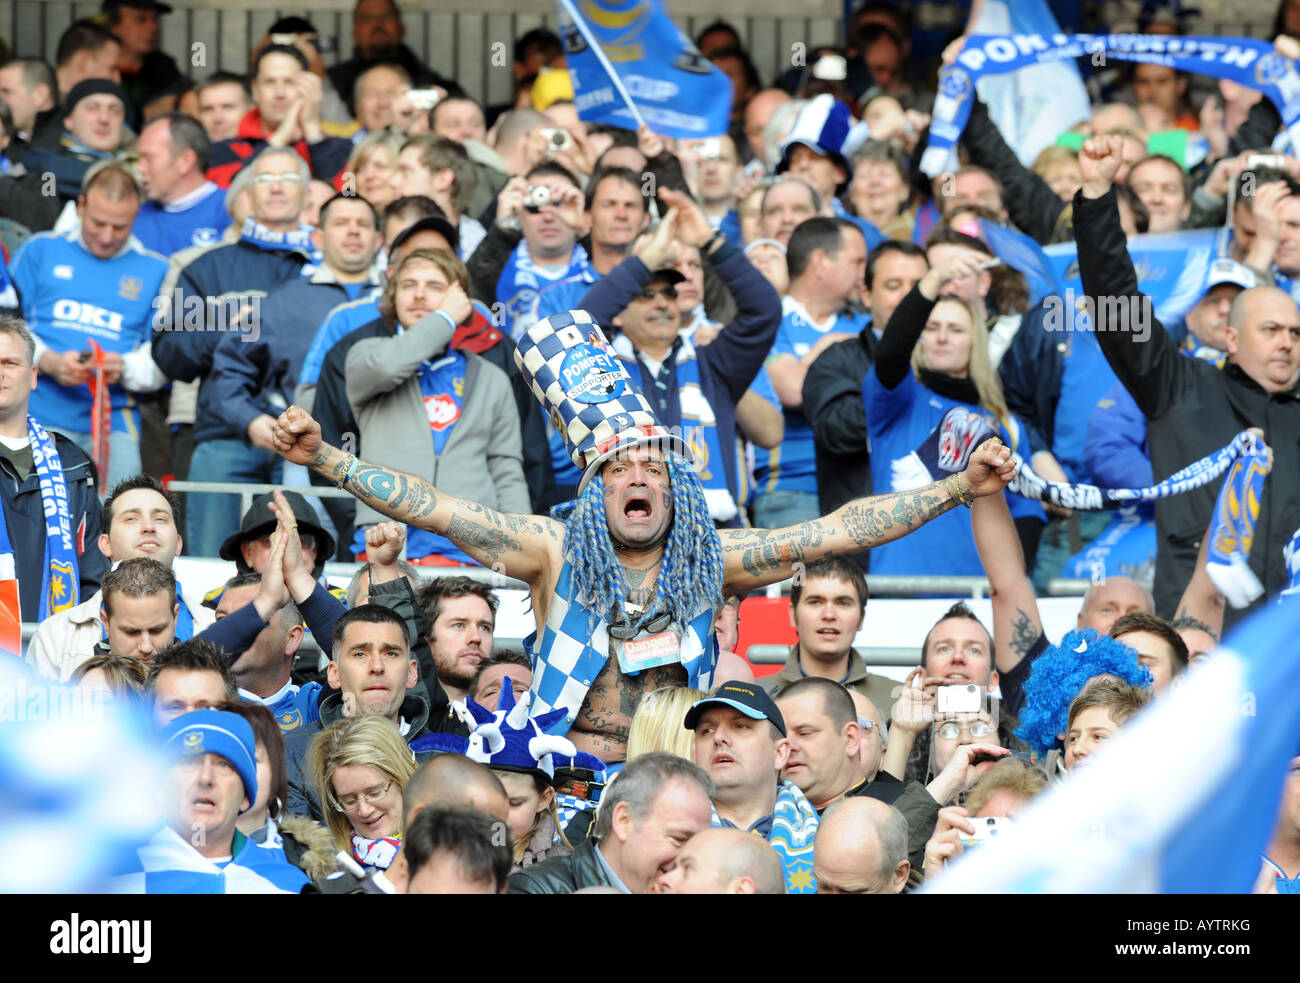 Portsmouth Football Club supporter John Westwood qui a changé son nom par balayage à John Portsmouth Football Photo Stock